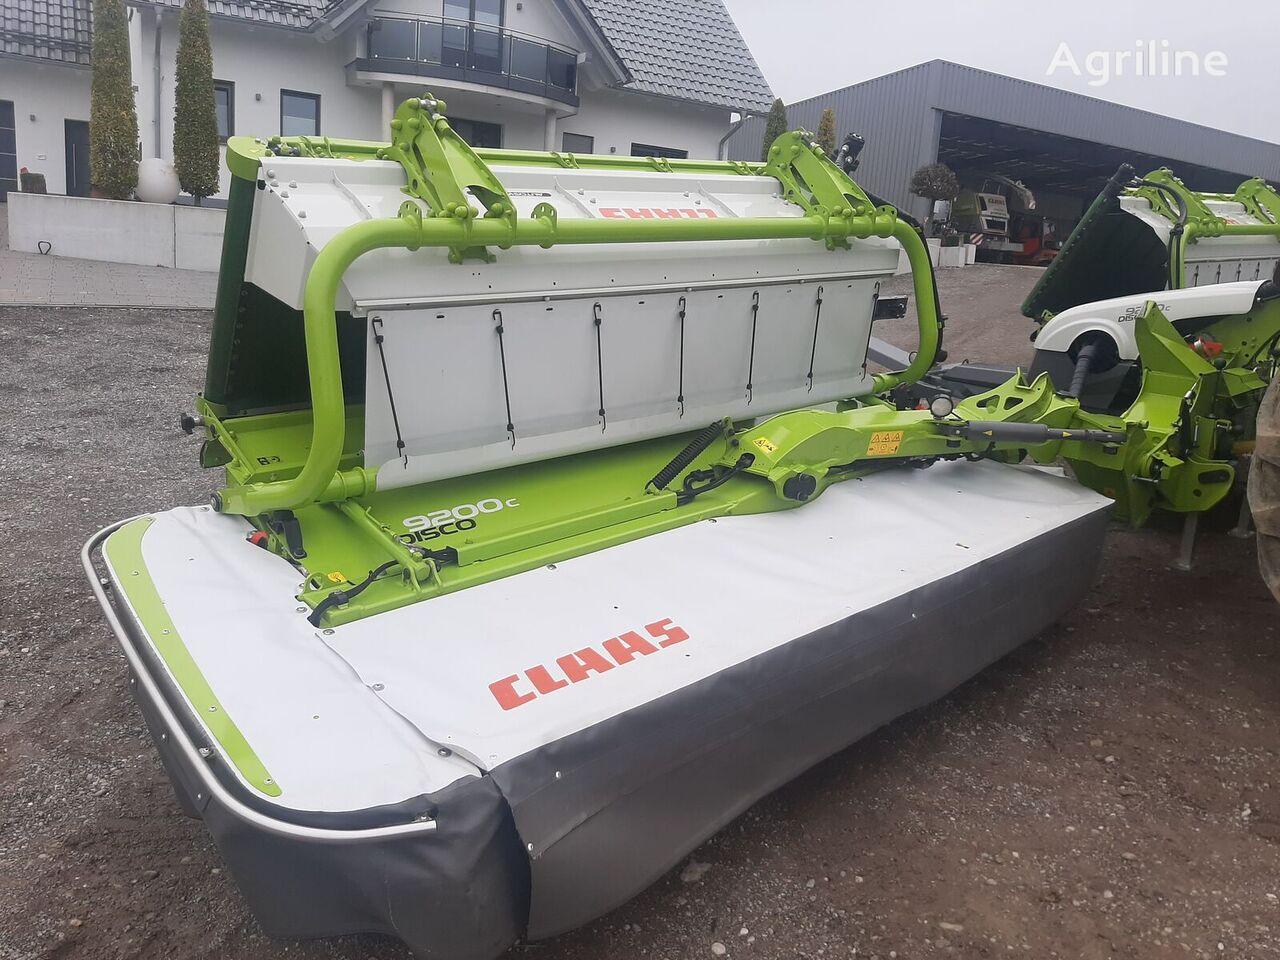 CLAAS Disco 9200 C AS mower